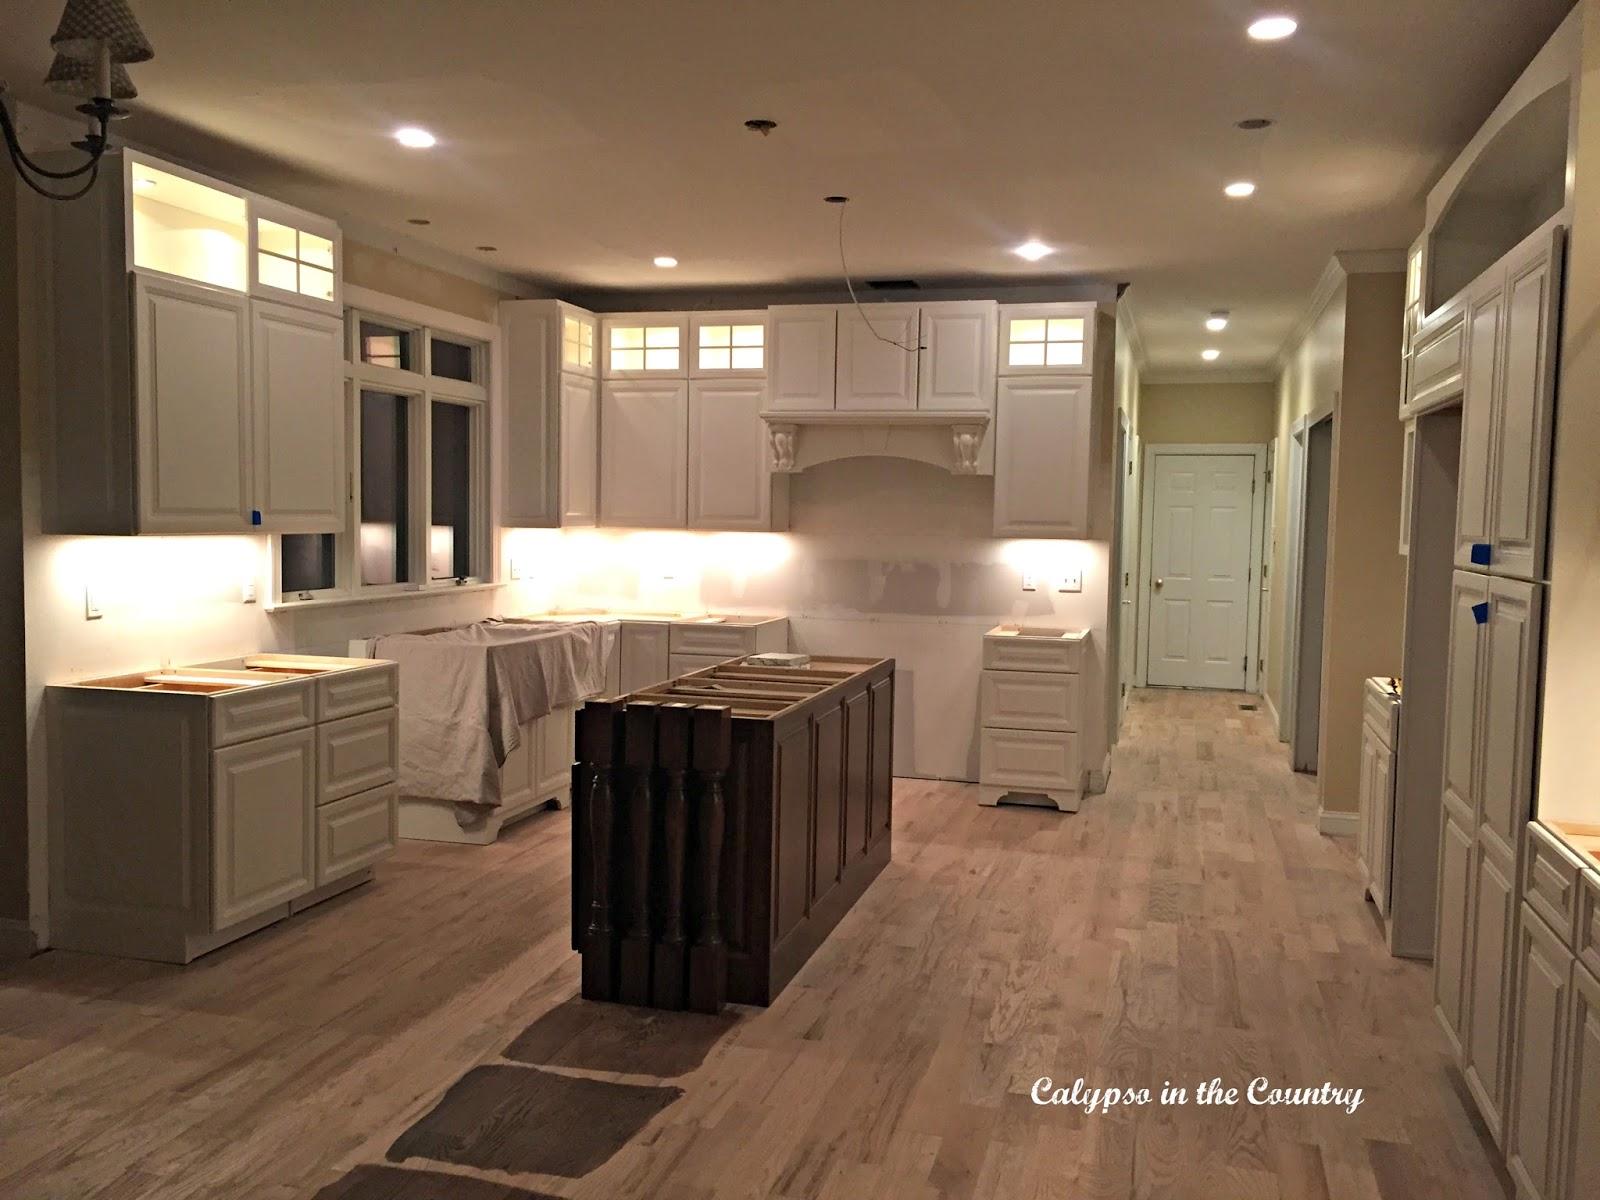 Kitchen Renovation Progress - Cabinet Lighting